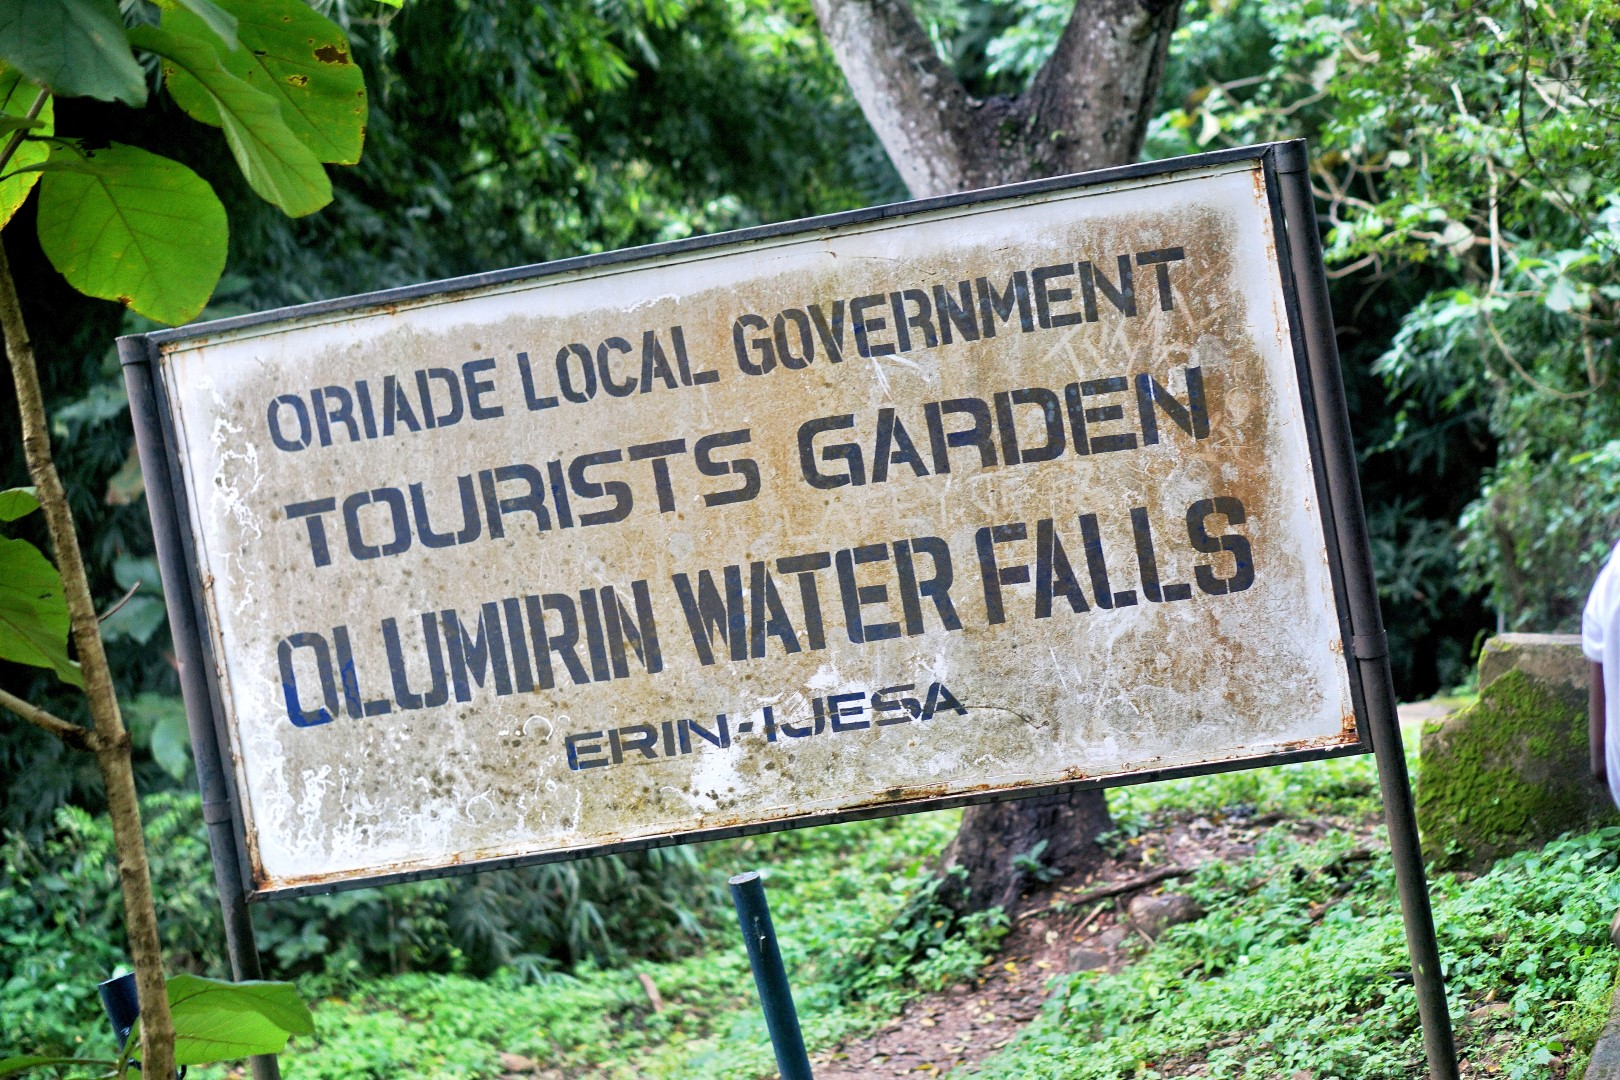 Sign showing entrance of Erin Ijesha waterfall